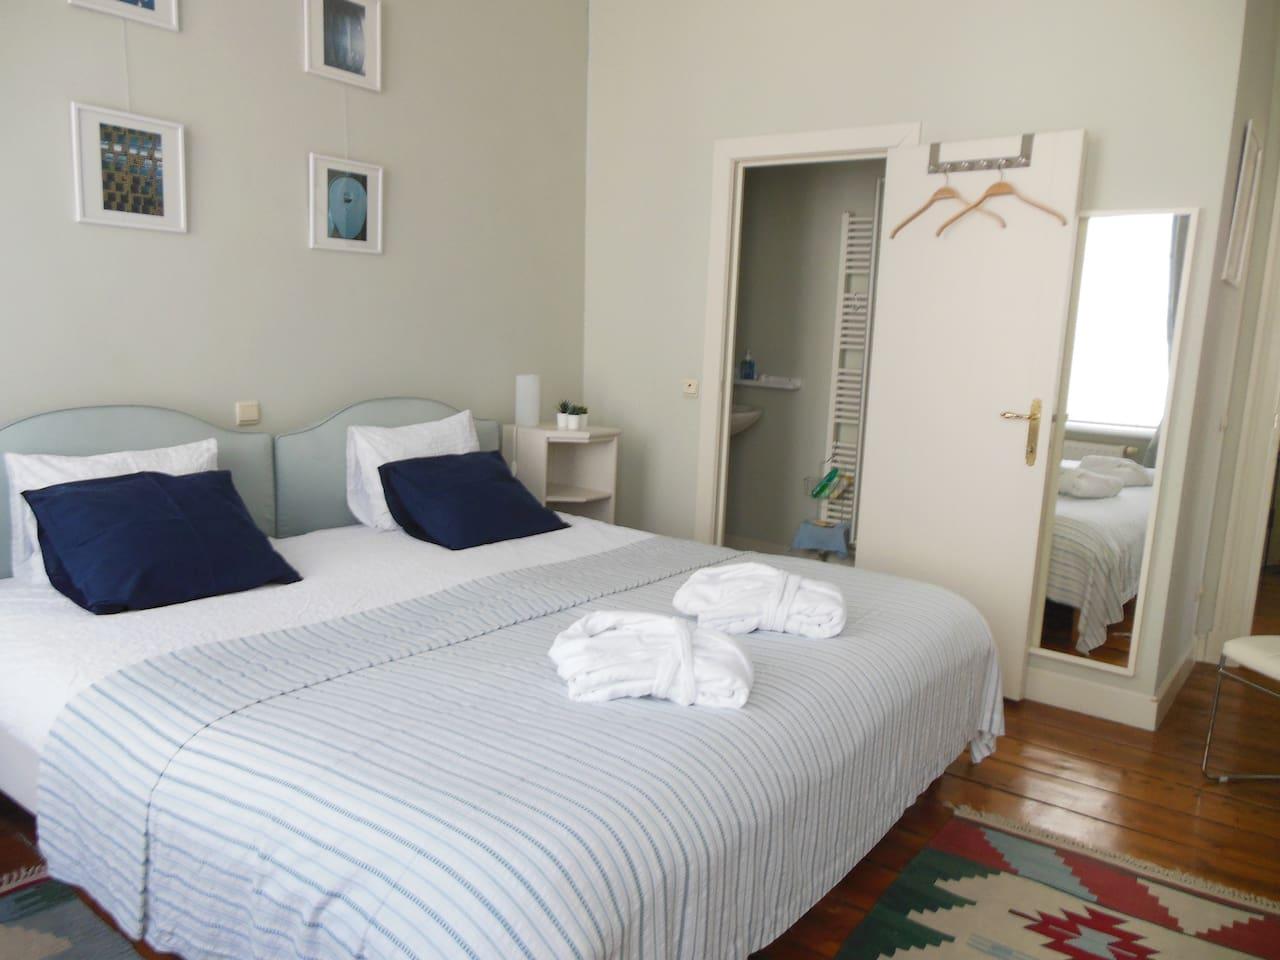 BEDROOM AND SHOWERROOM ENSUITE